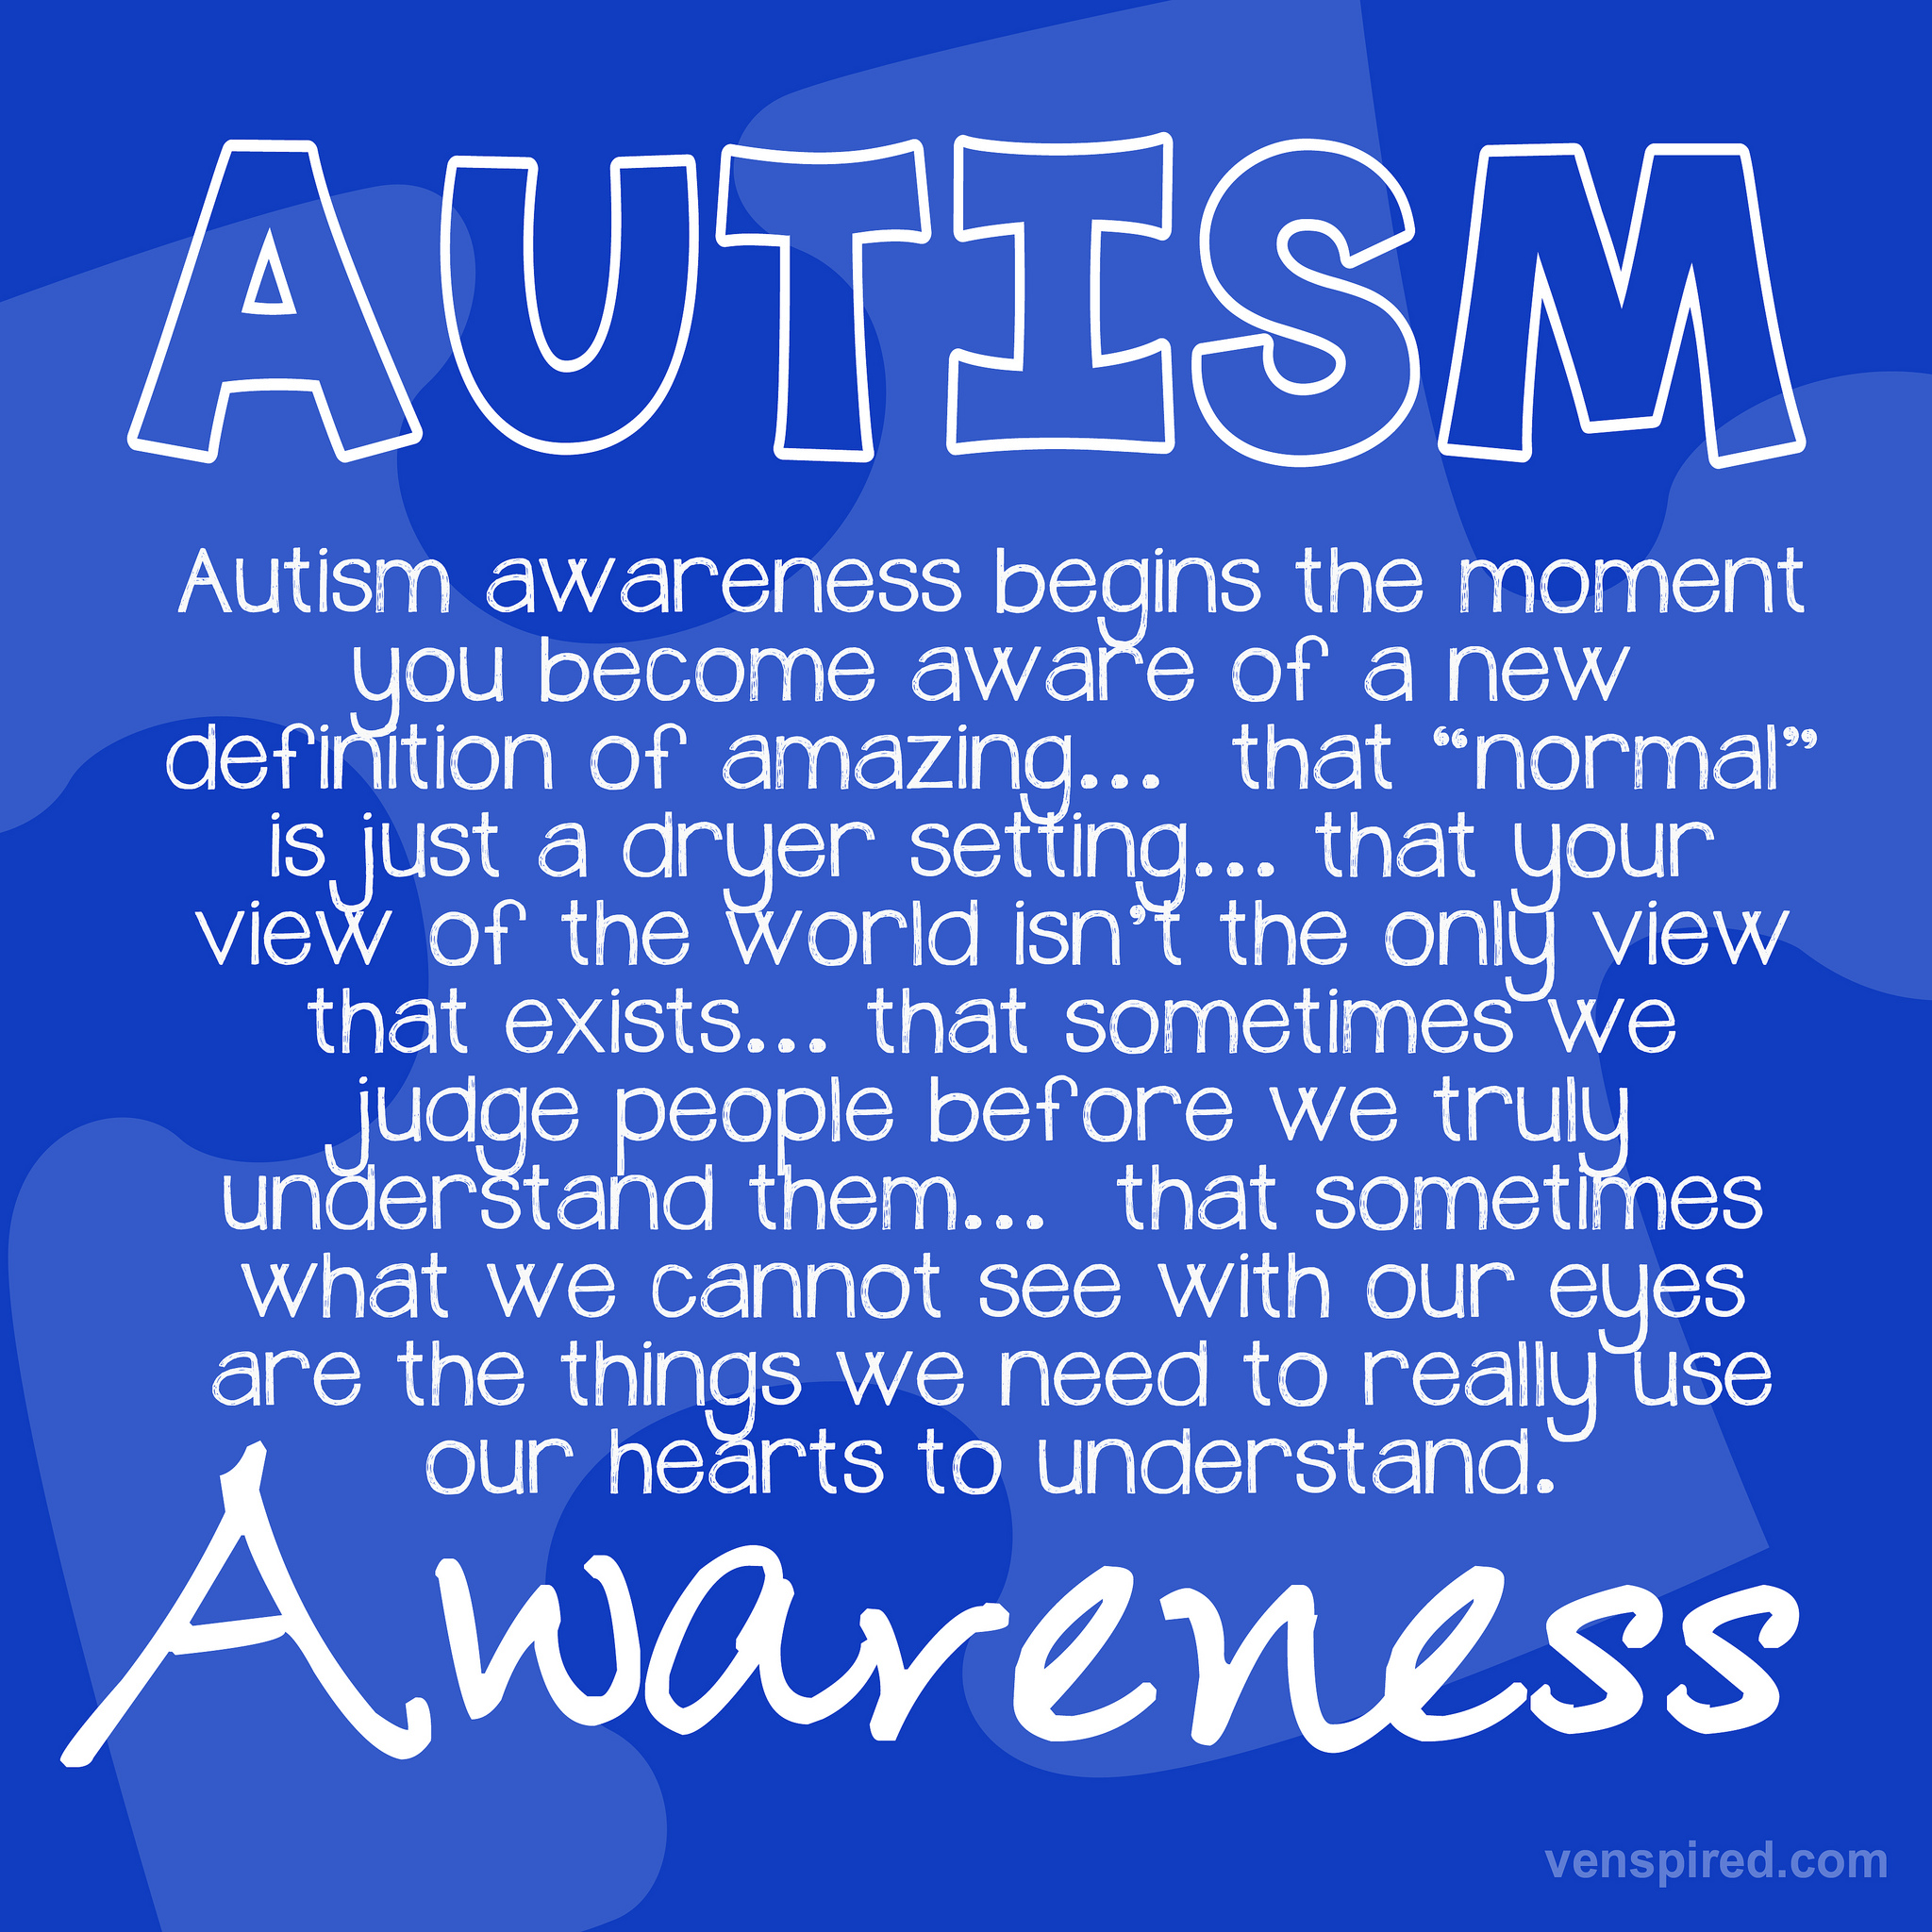 Autism Awareness Month 2014 | www.imgkid.com - 1358.2KB